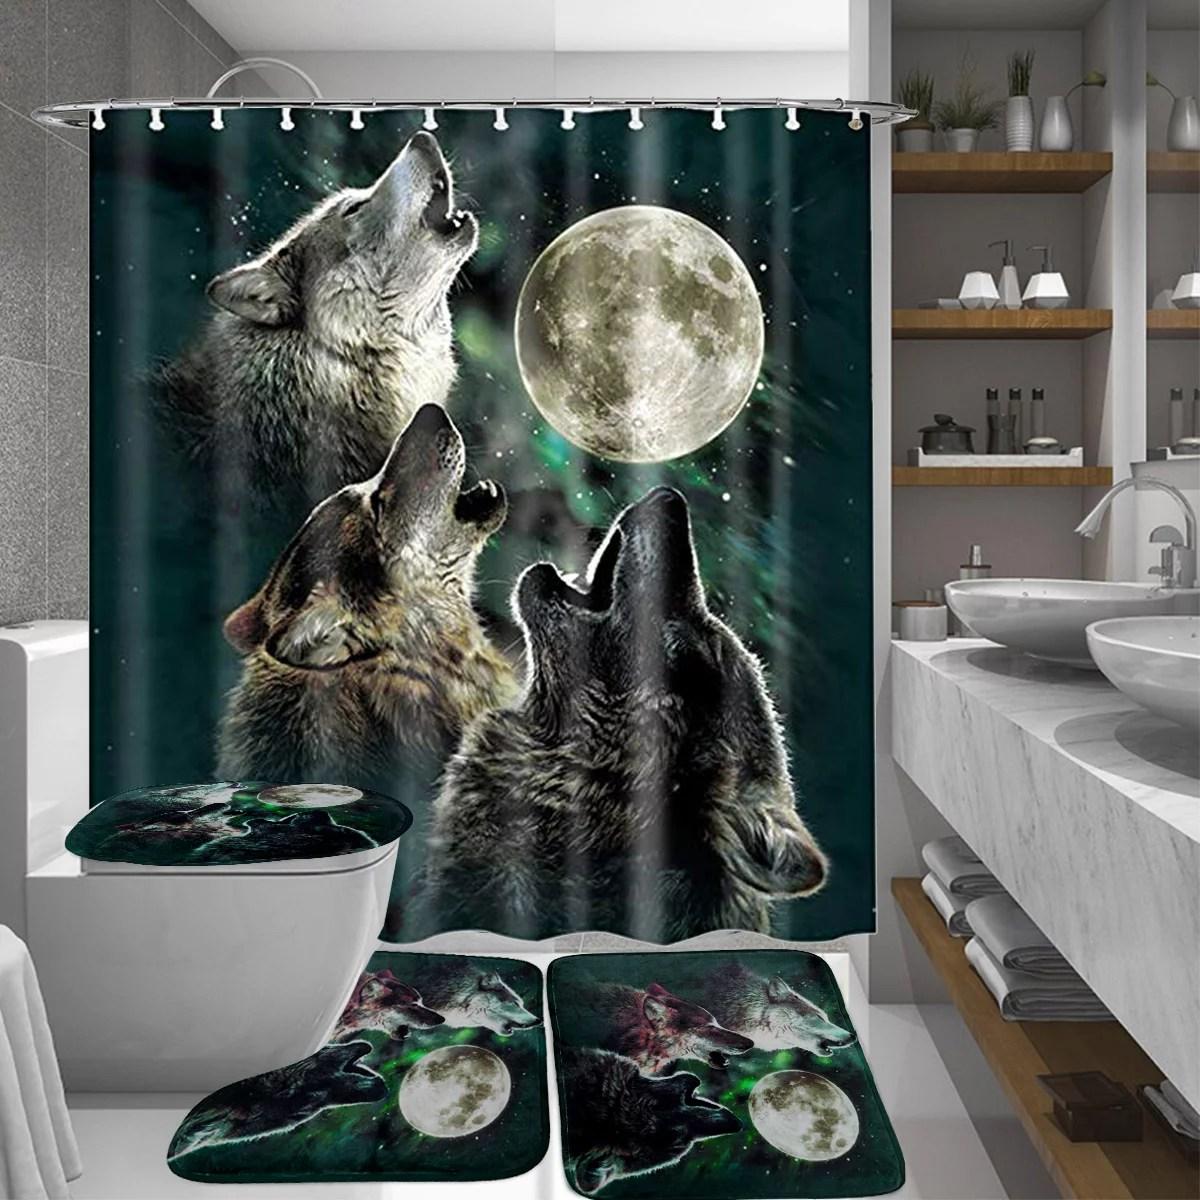 moon wolf bathroom 4pcs set waterproof shower curtain base pedestal rug non slip bath mats toilet lid seat cover for home kitchen